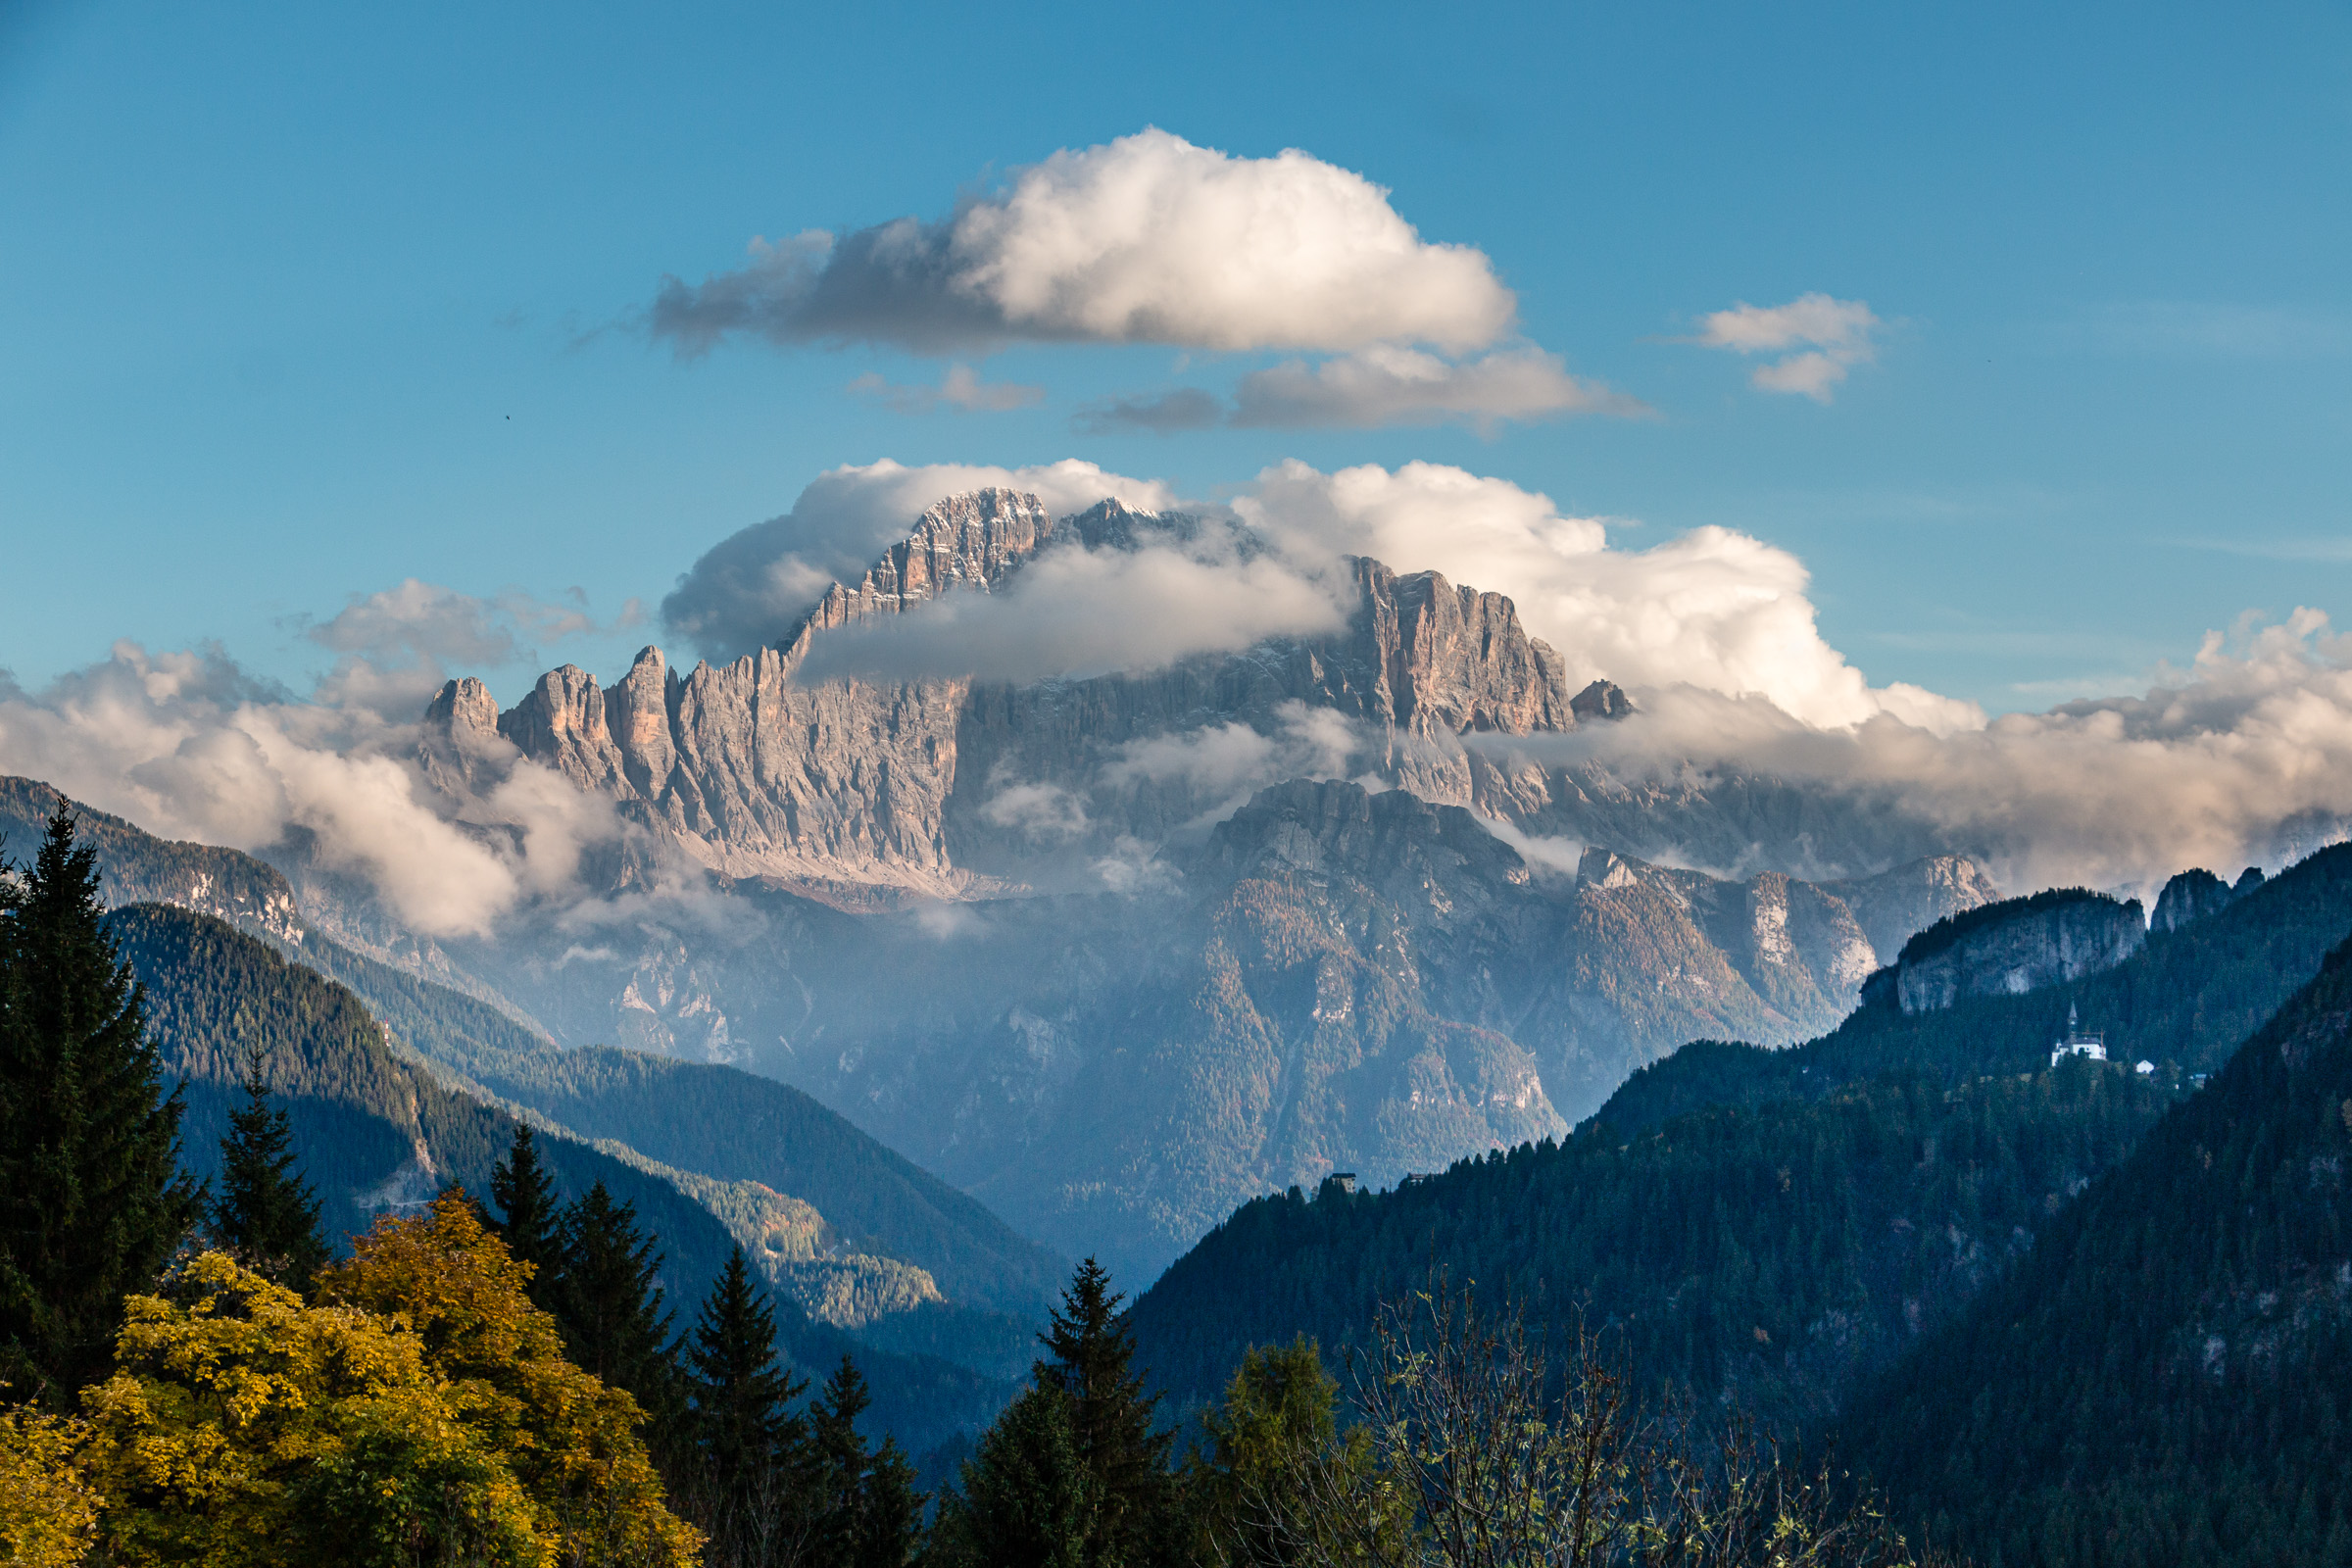 Mount Civetta, Dolomites, Italy